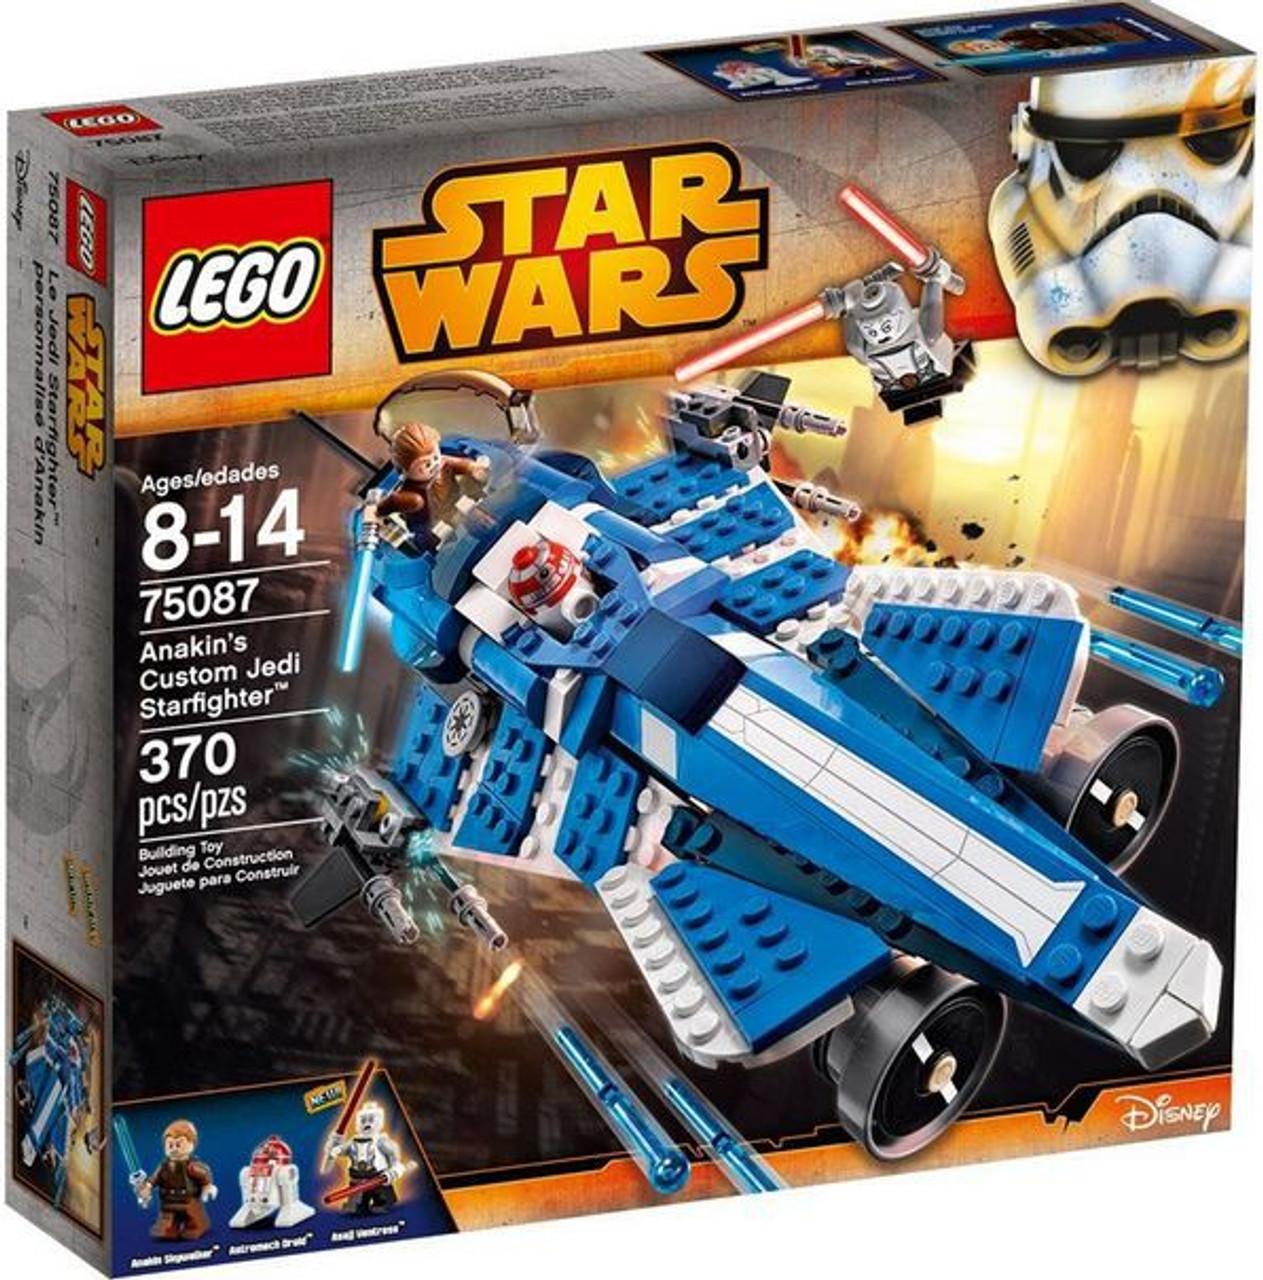 LEGO Star Wars The Clone Wars Anakins Custom Jedi Starfighter Exclusive Set  75087 - ToyWiz 8d880729ac